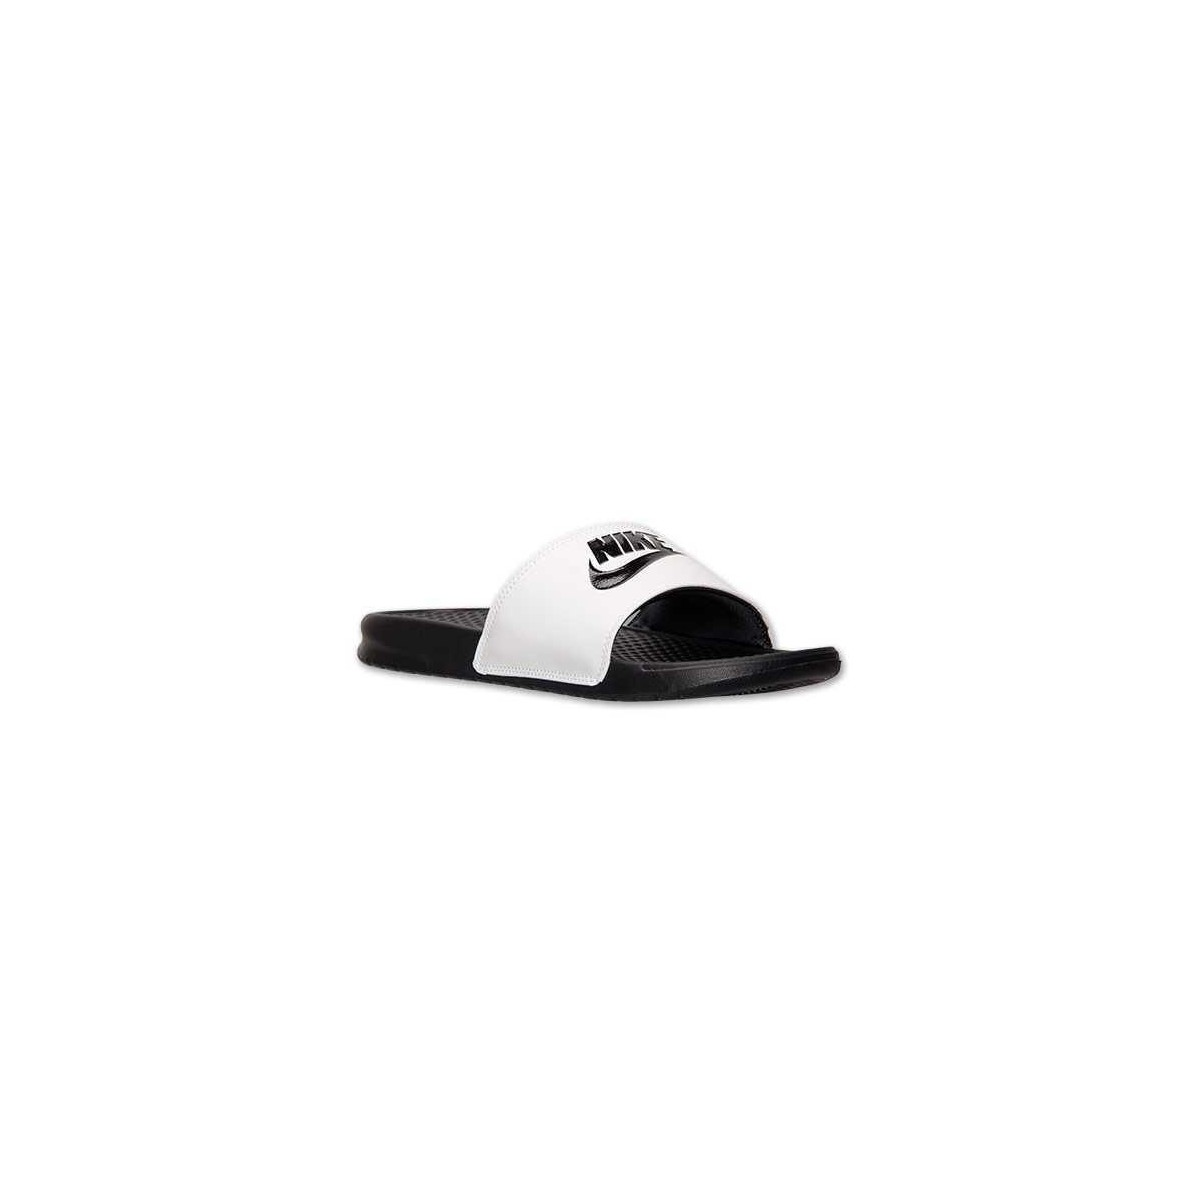 Nike benassi jdi chanclas hombre 343880 100 blancas HivAsPg